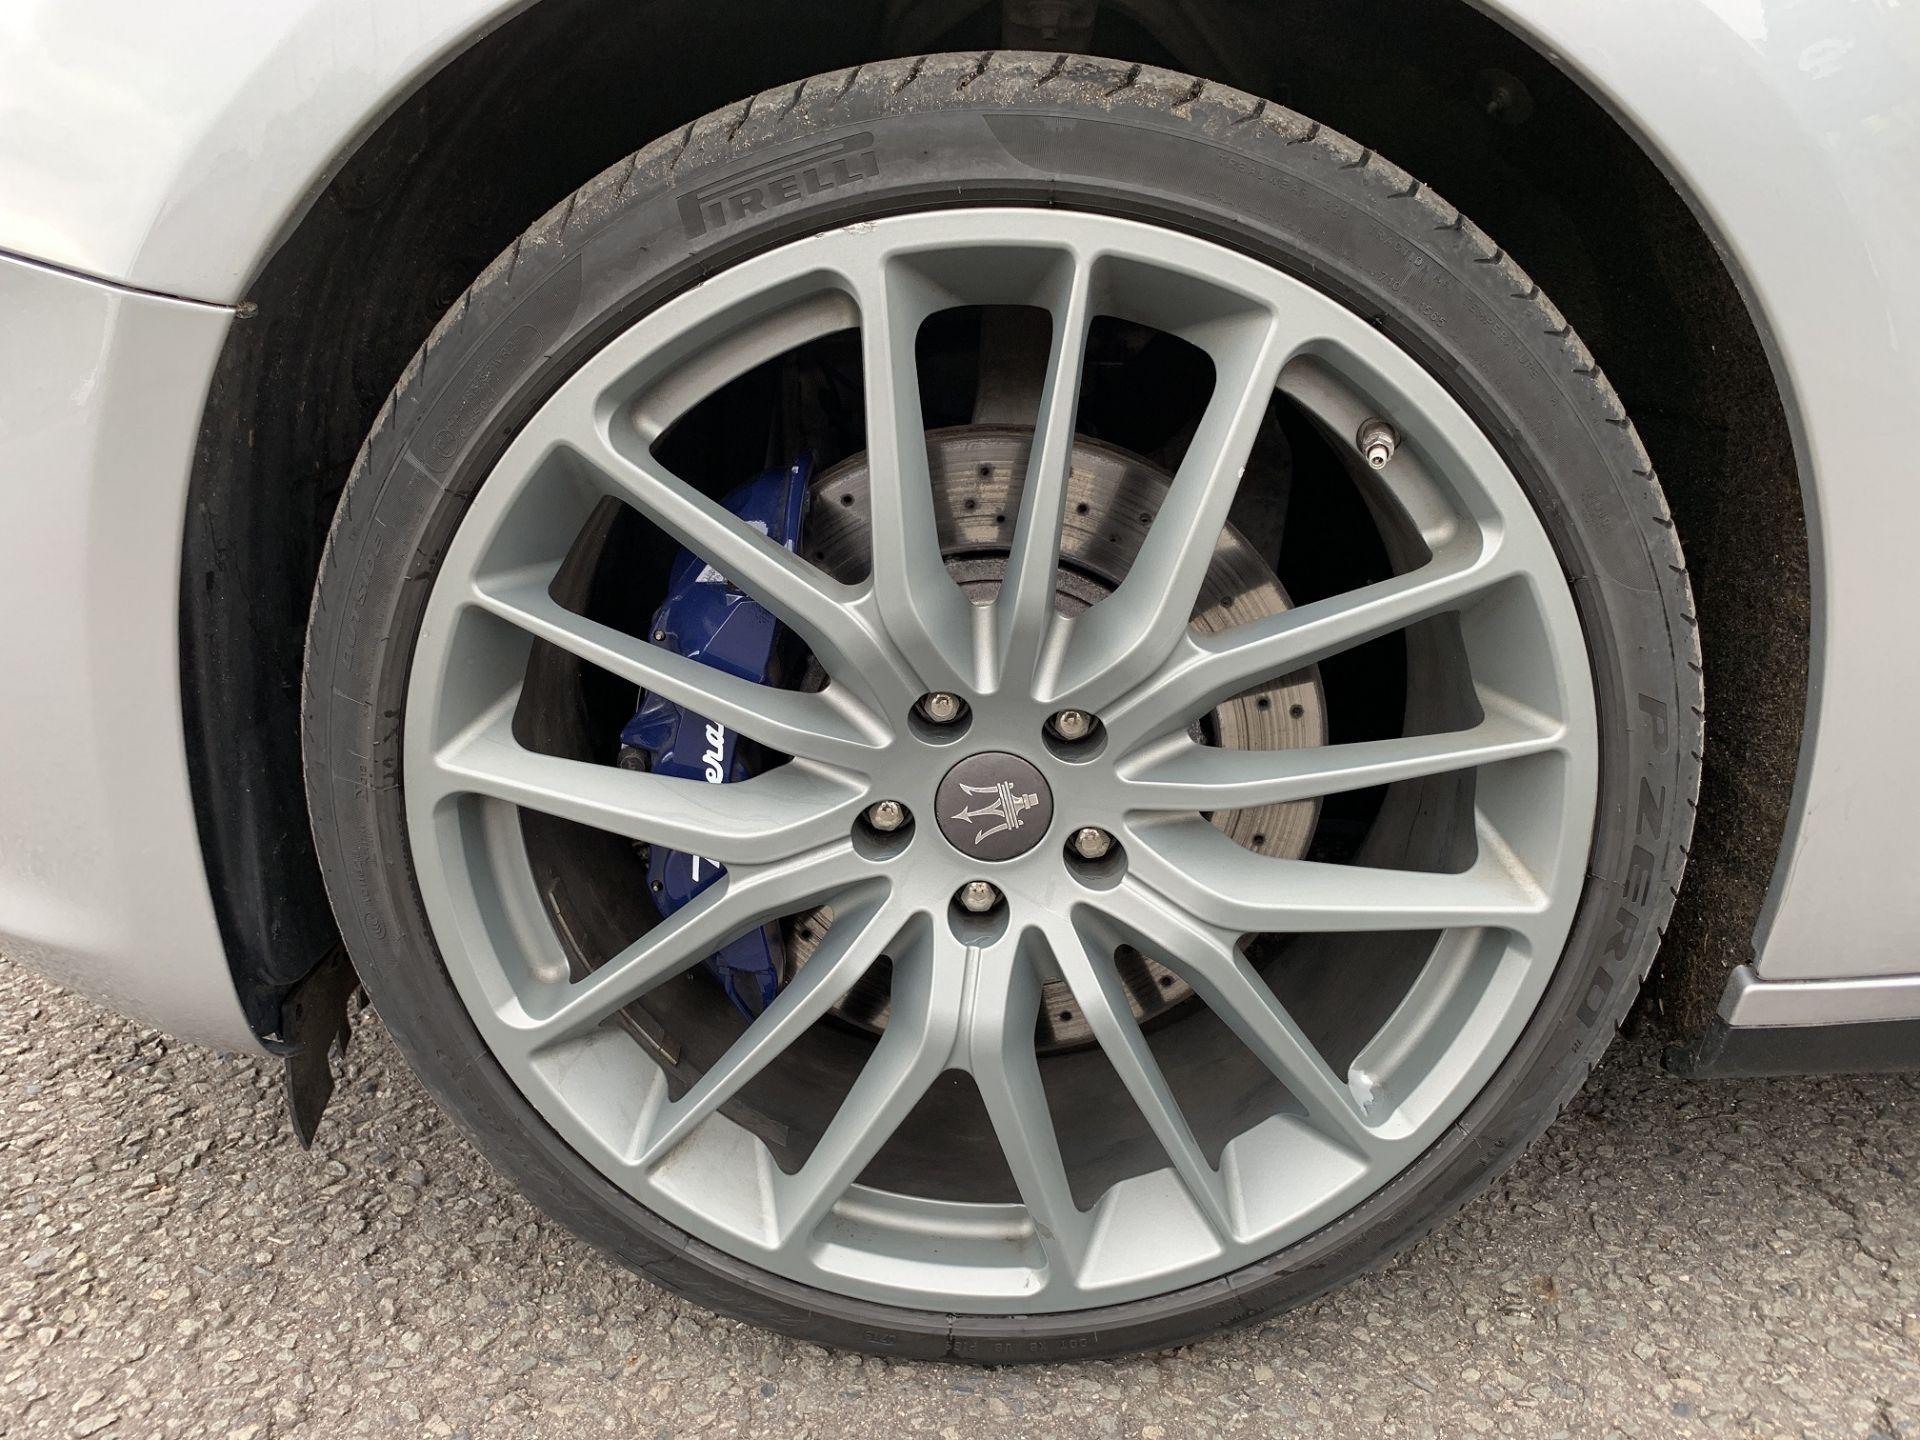 Lot 7 - 2016/16 REG MASERATI GHIBLI S V6 AUTO 3.0 PETROL 4 DOOR SALOON, SHOWING 2 FORMER KEEPERS *NO VAT*